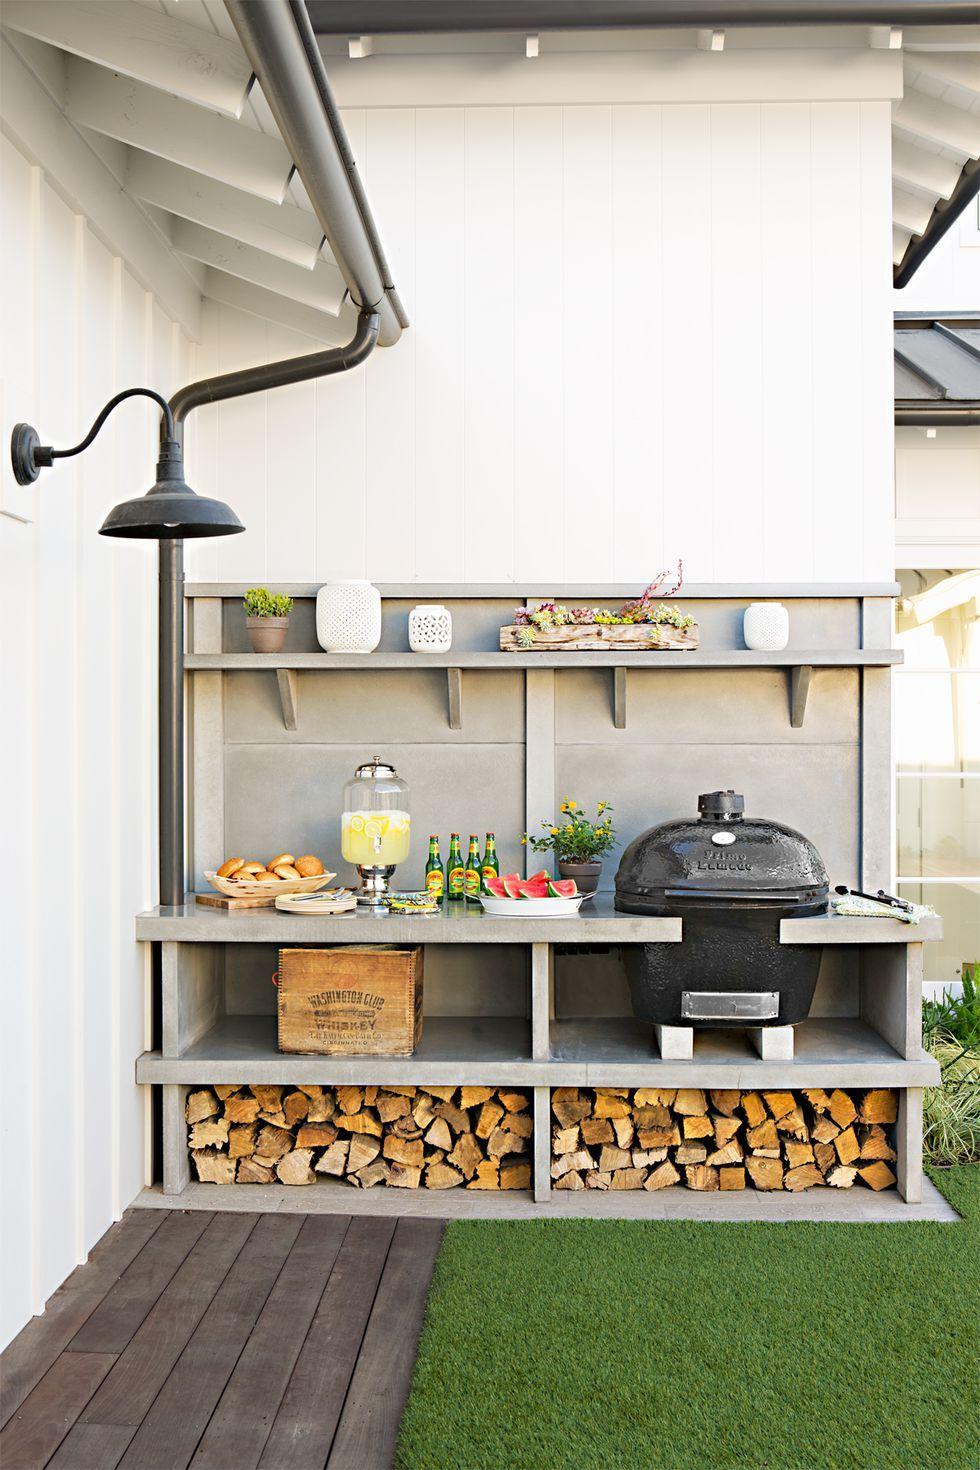 42 easy breezy beach house decorating ideas outdoors outdoor rh pinterest com